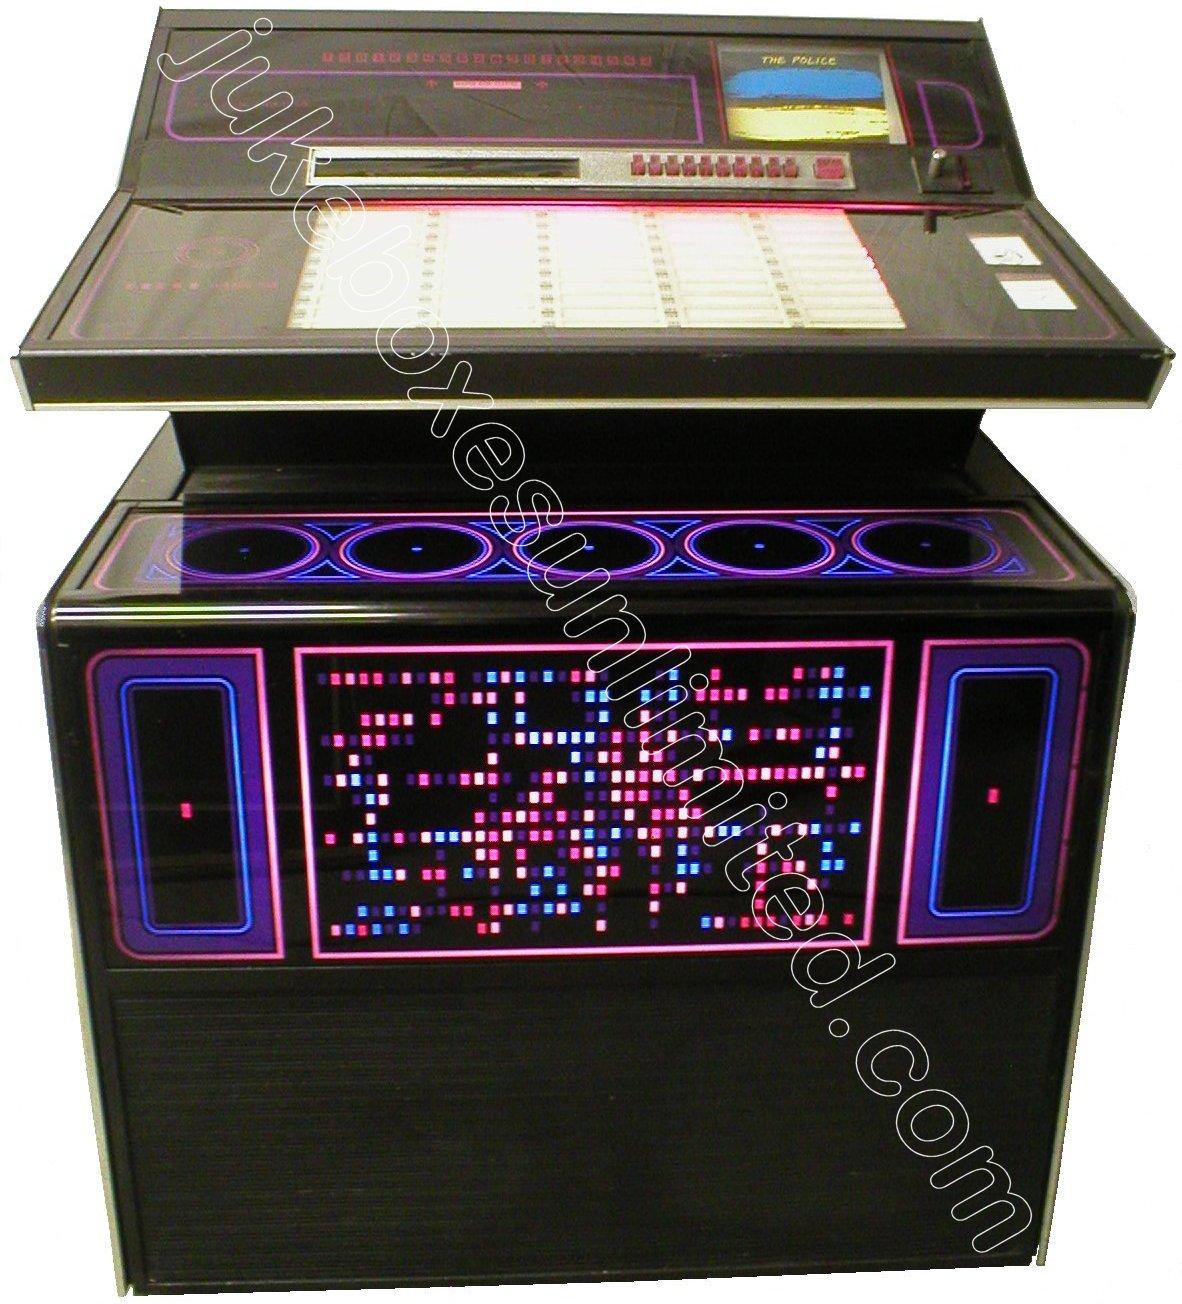 Rockola Jukebox Values 1974 Rockola 453 Jukebox For